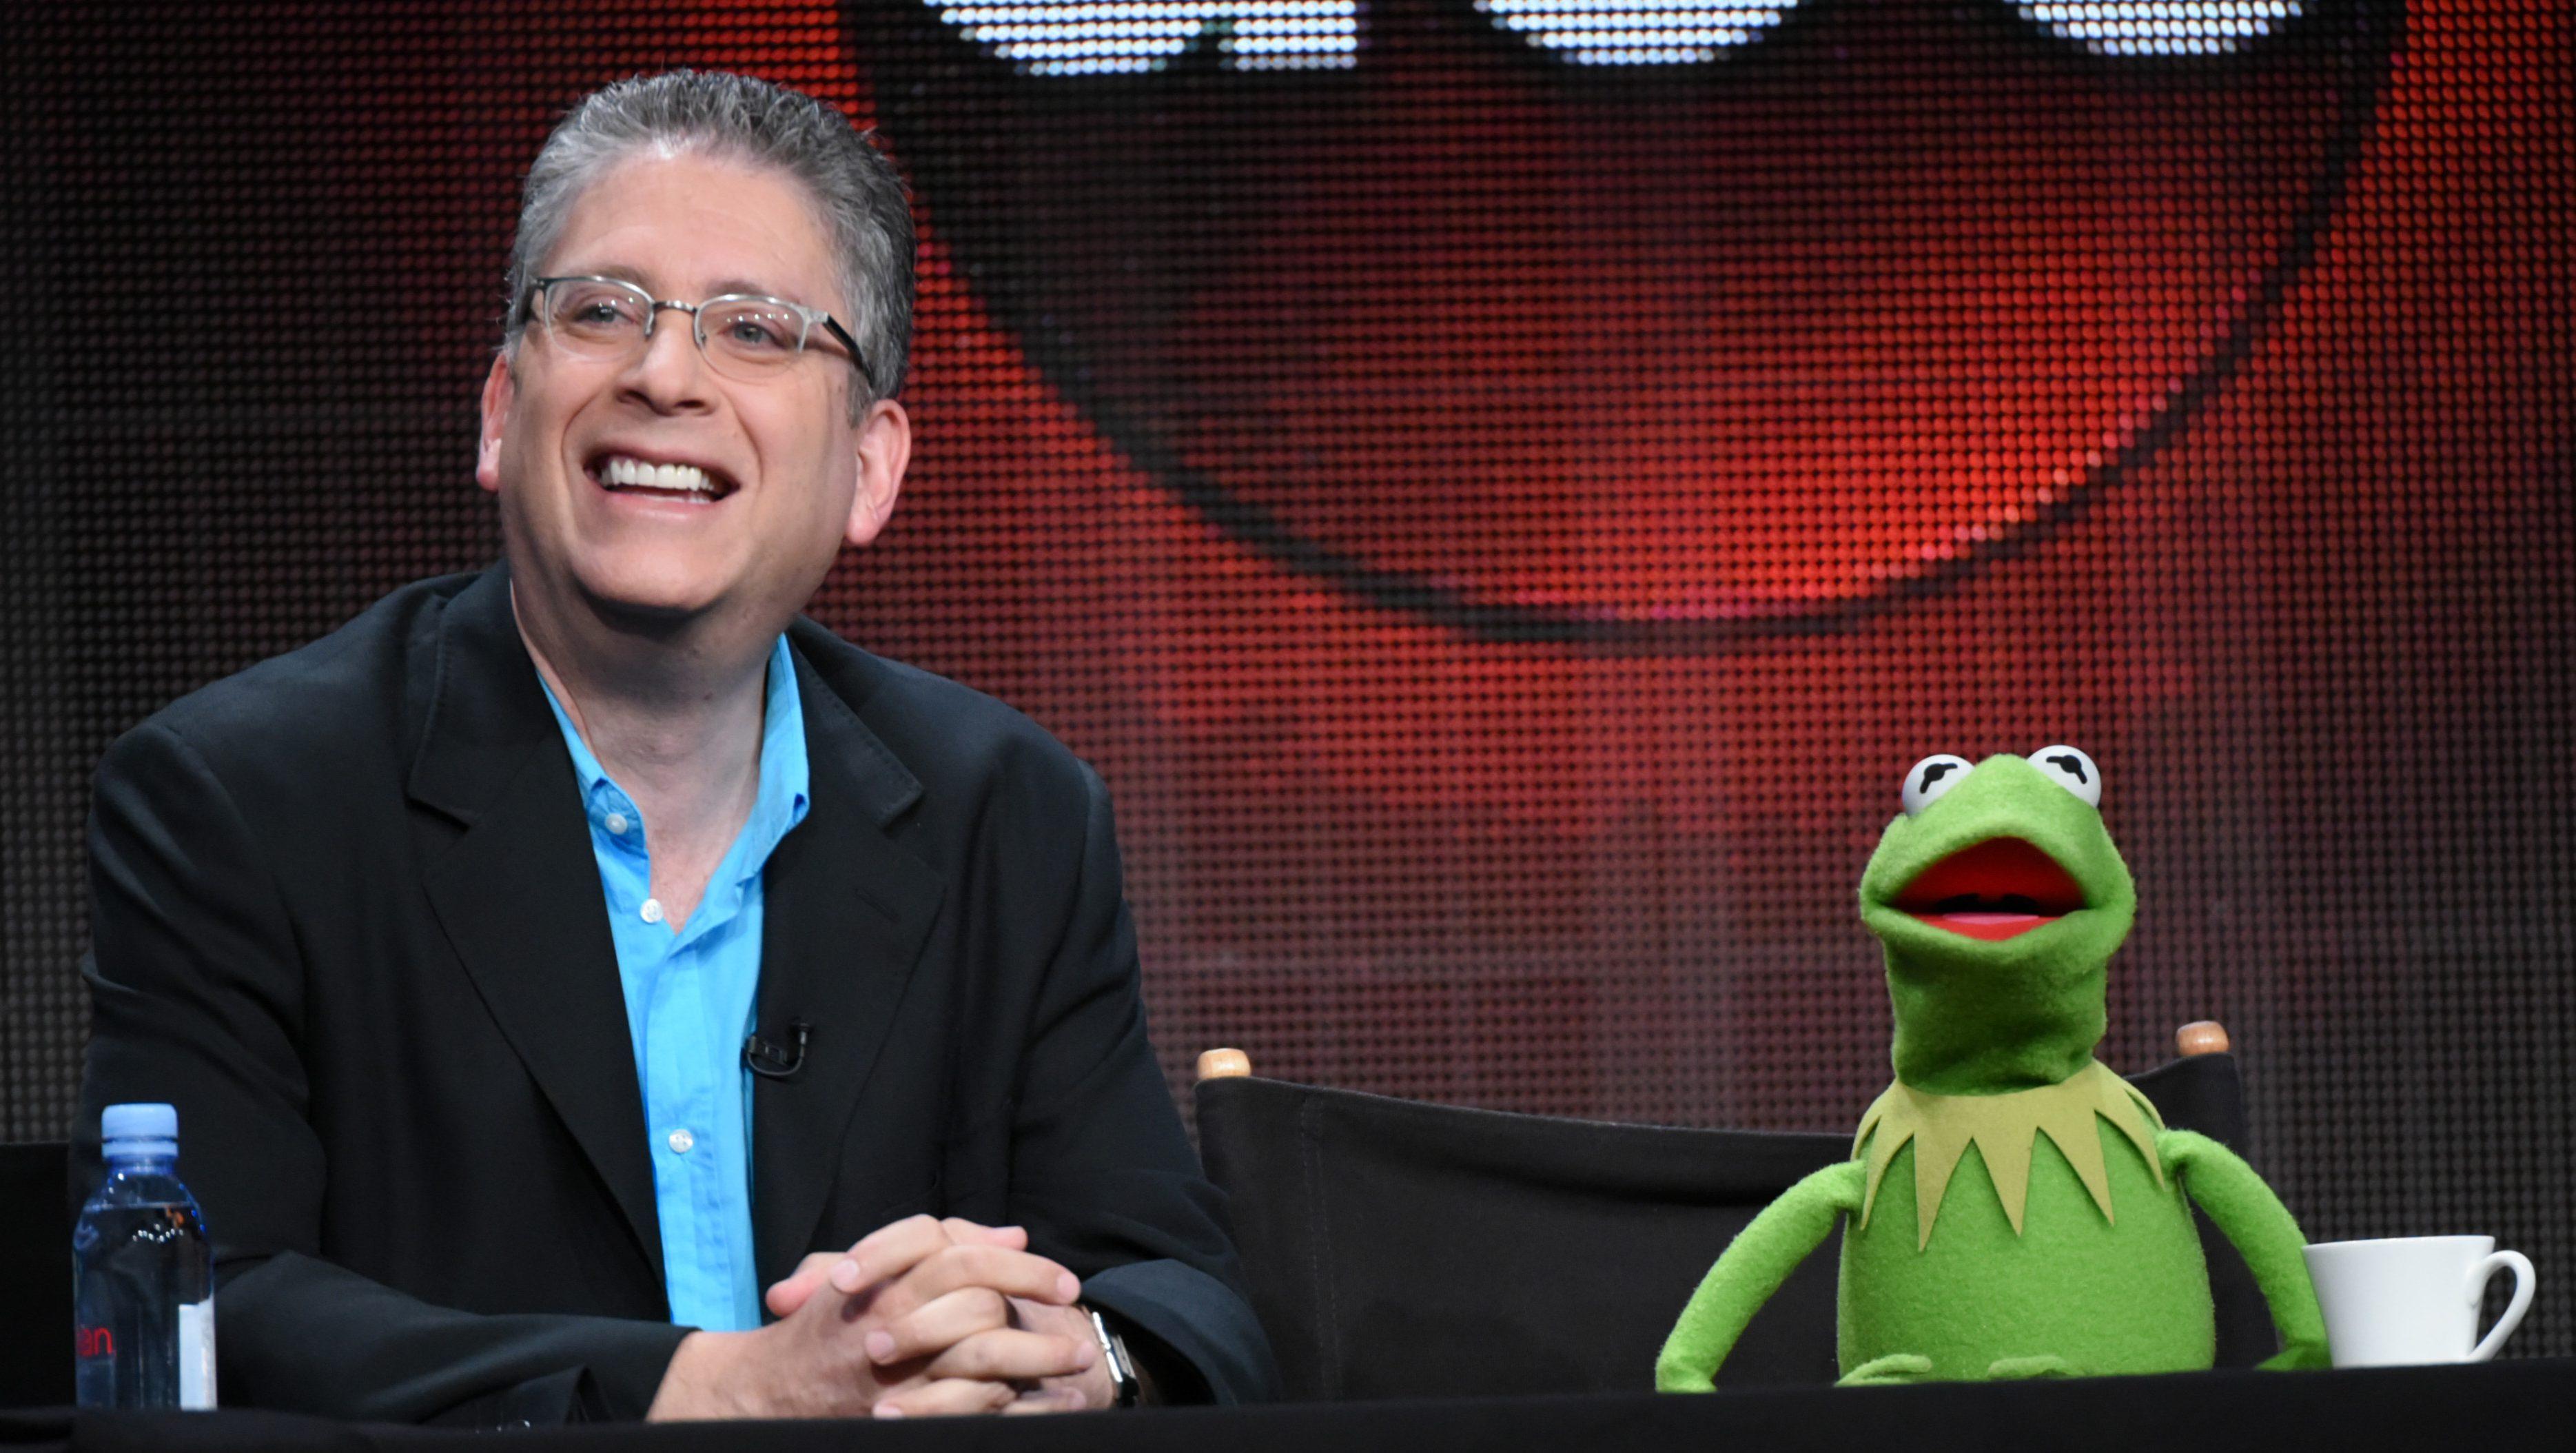 Bill Prady, Kermit the Frog